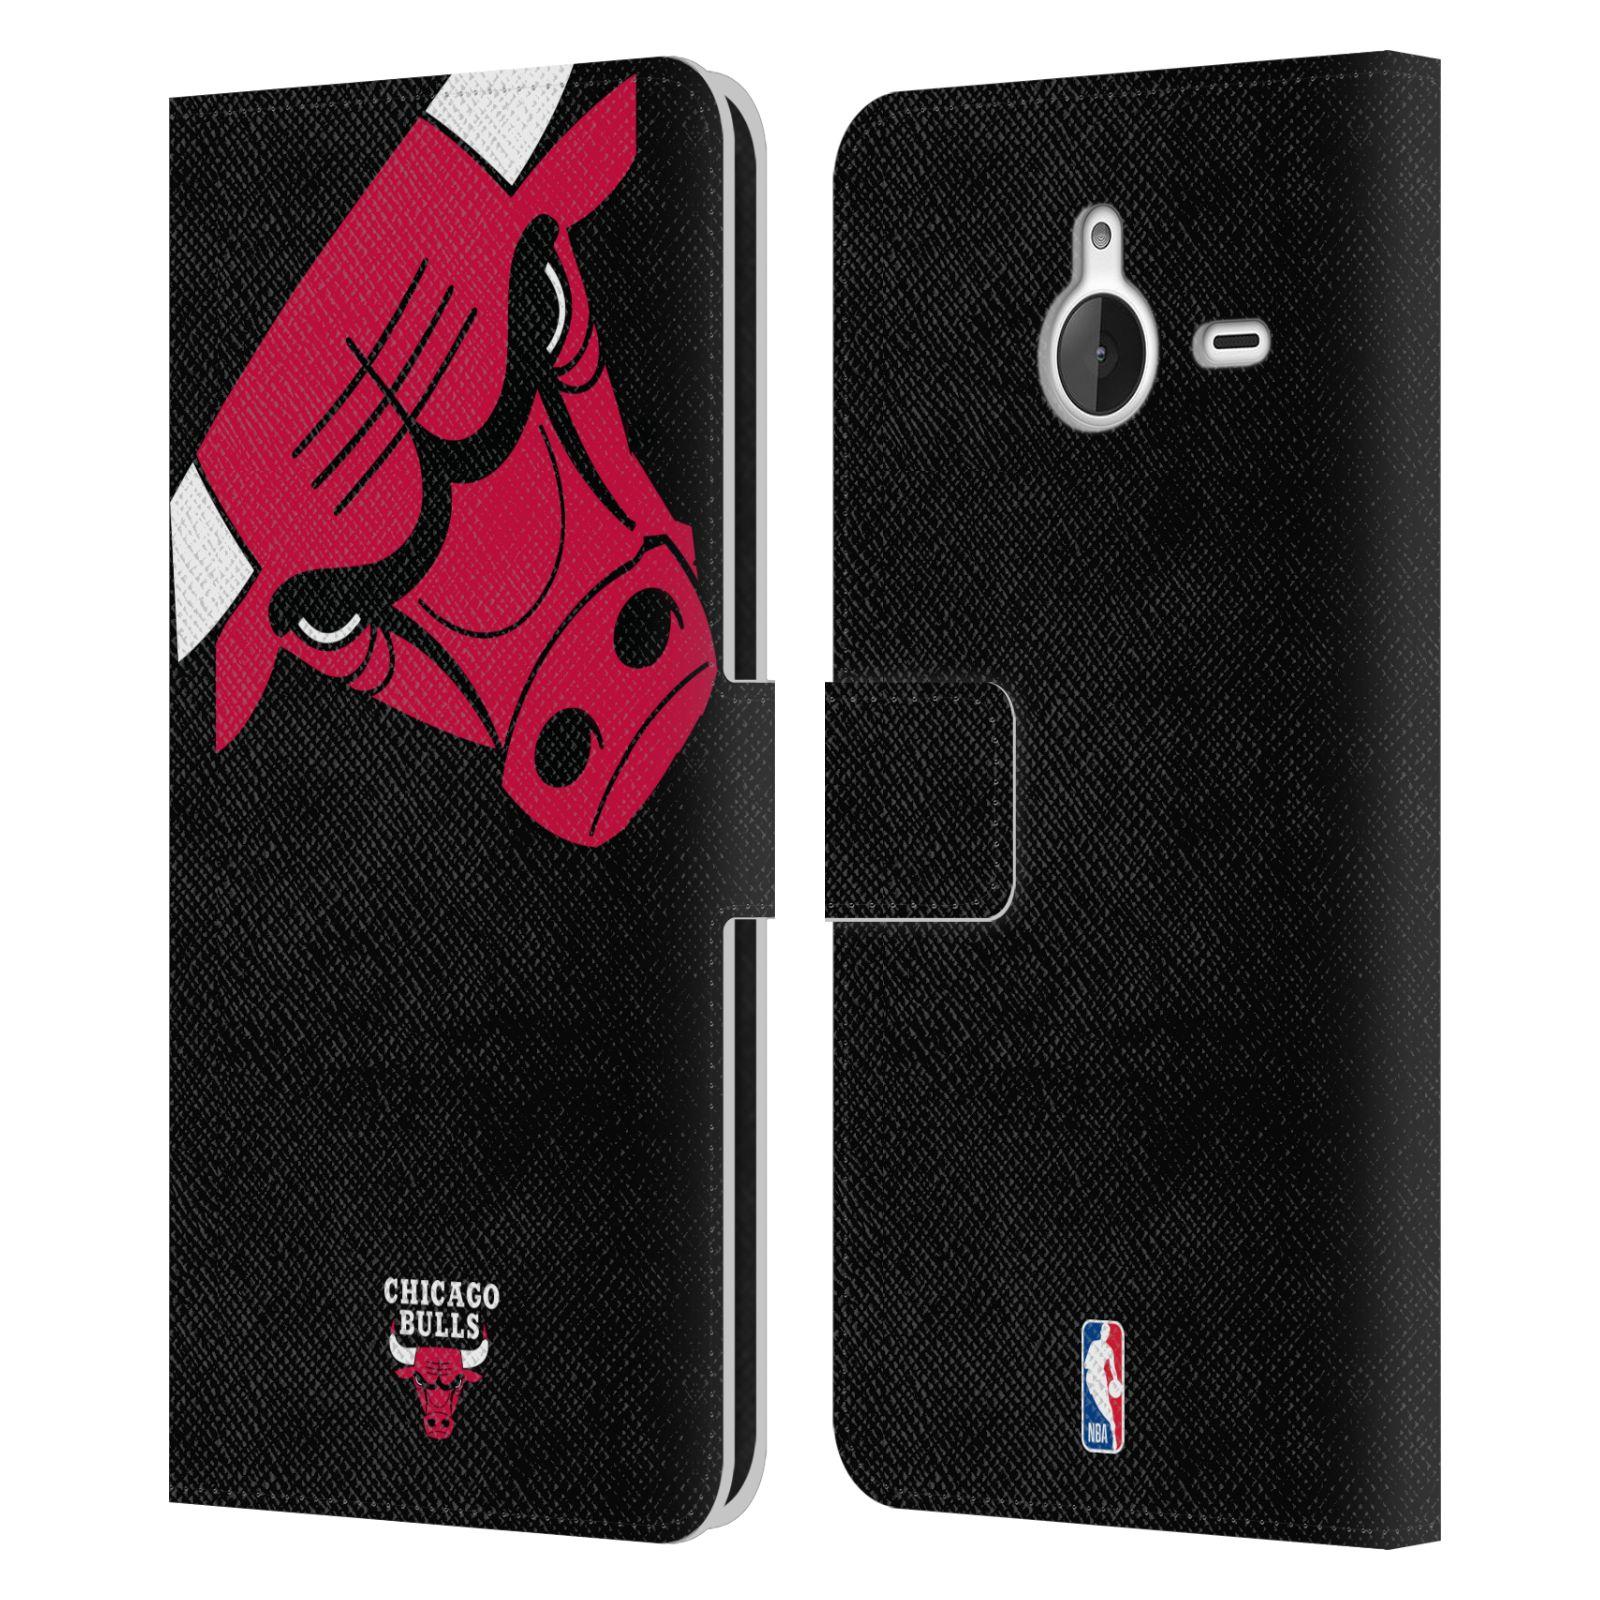 Pouzdro na mobil Nokia Lumia 640 XL - Head Case -NBA - Chicago Bulls červená barva velký znak